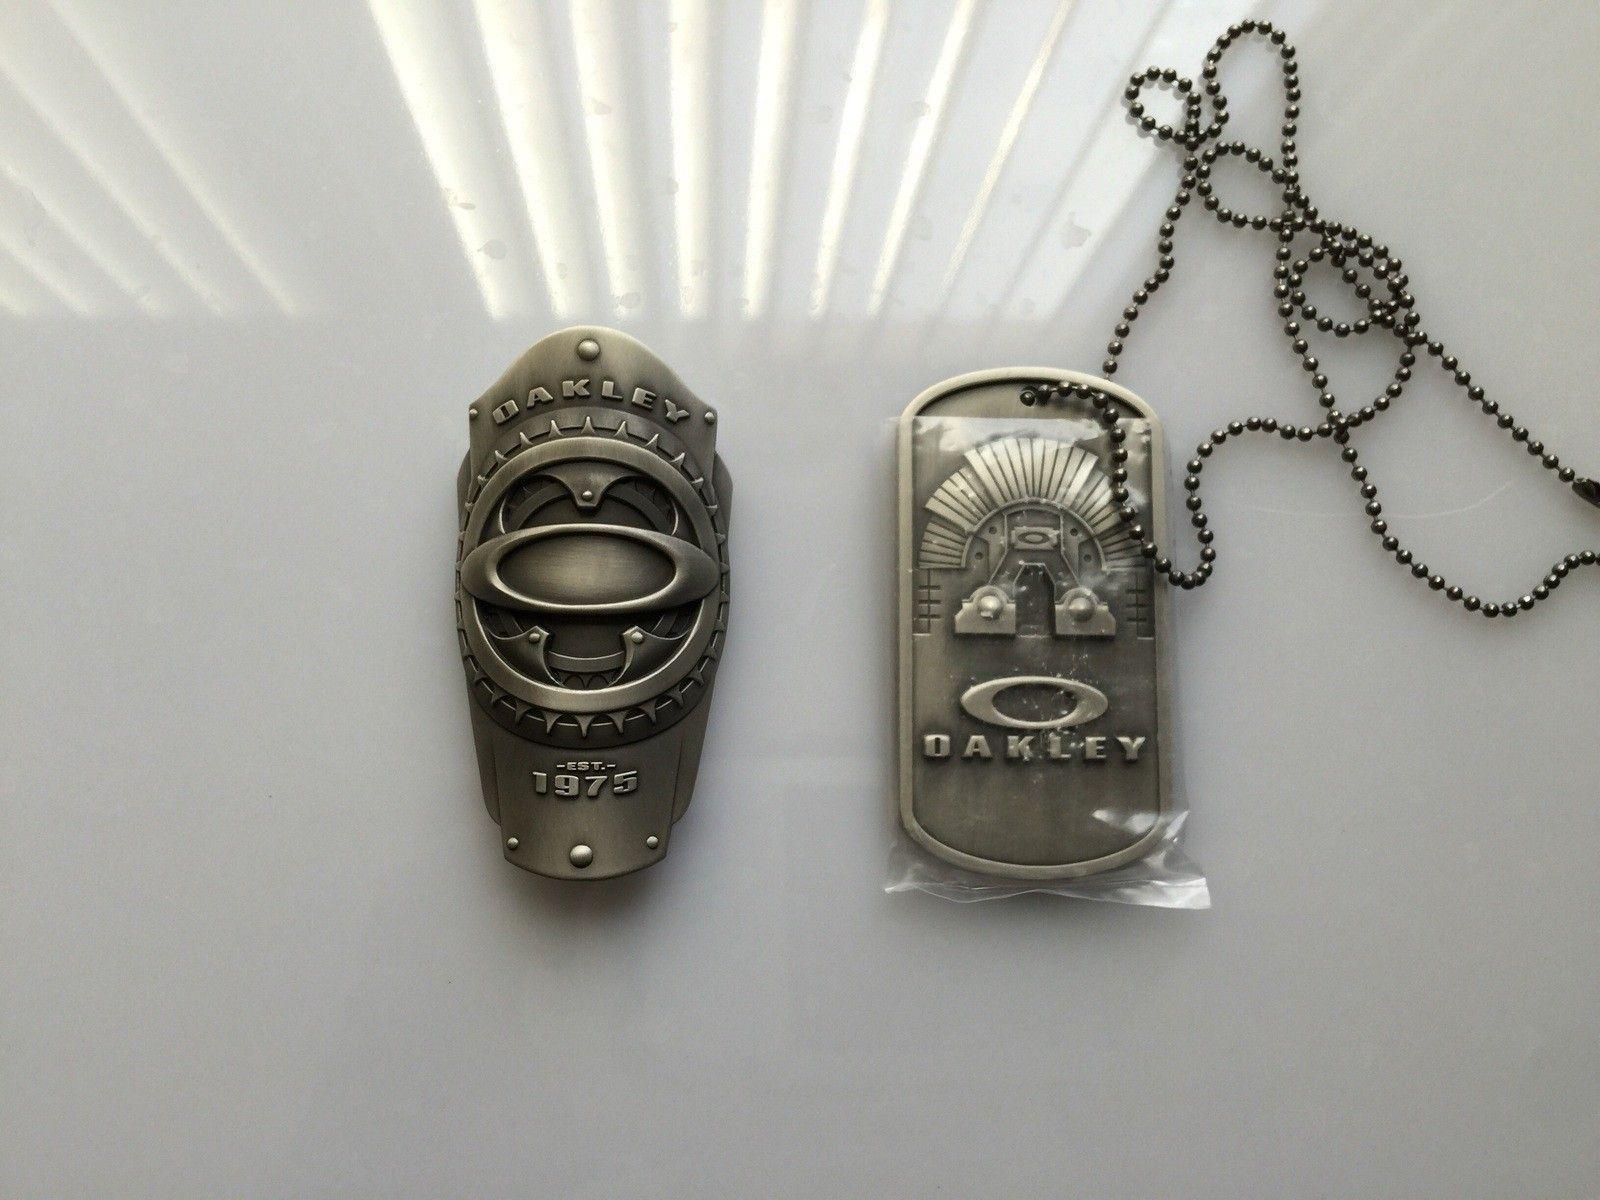 Oakley metal works sheriff badge and big dog tag - image.jpg